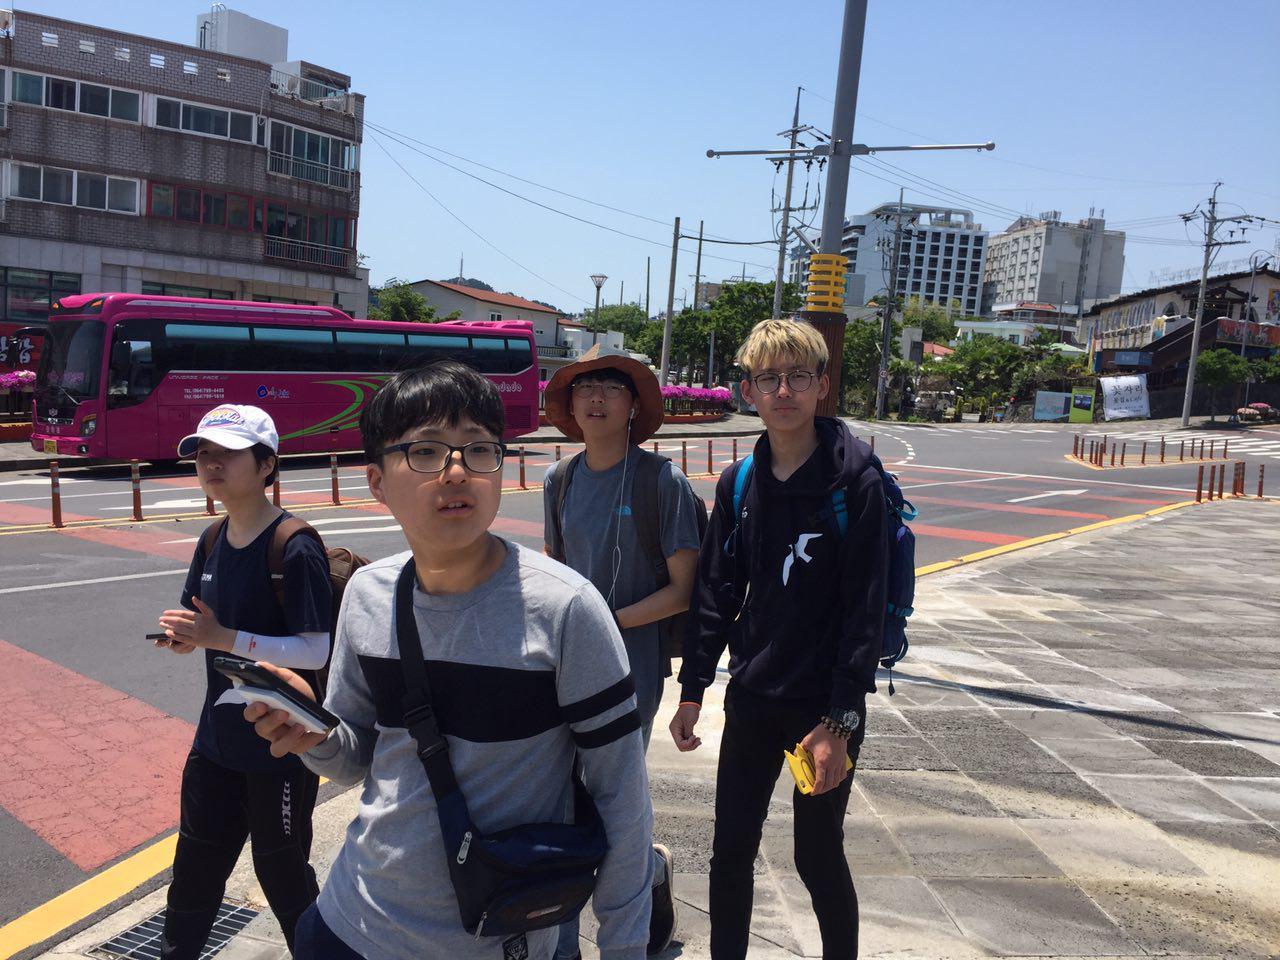 photo_2017-05-29_13-24-46.jpg